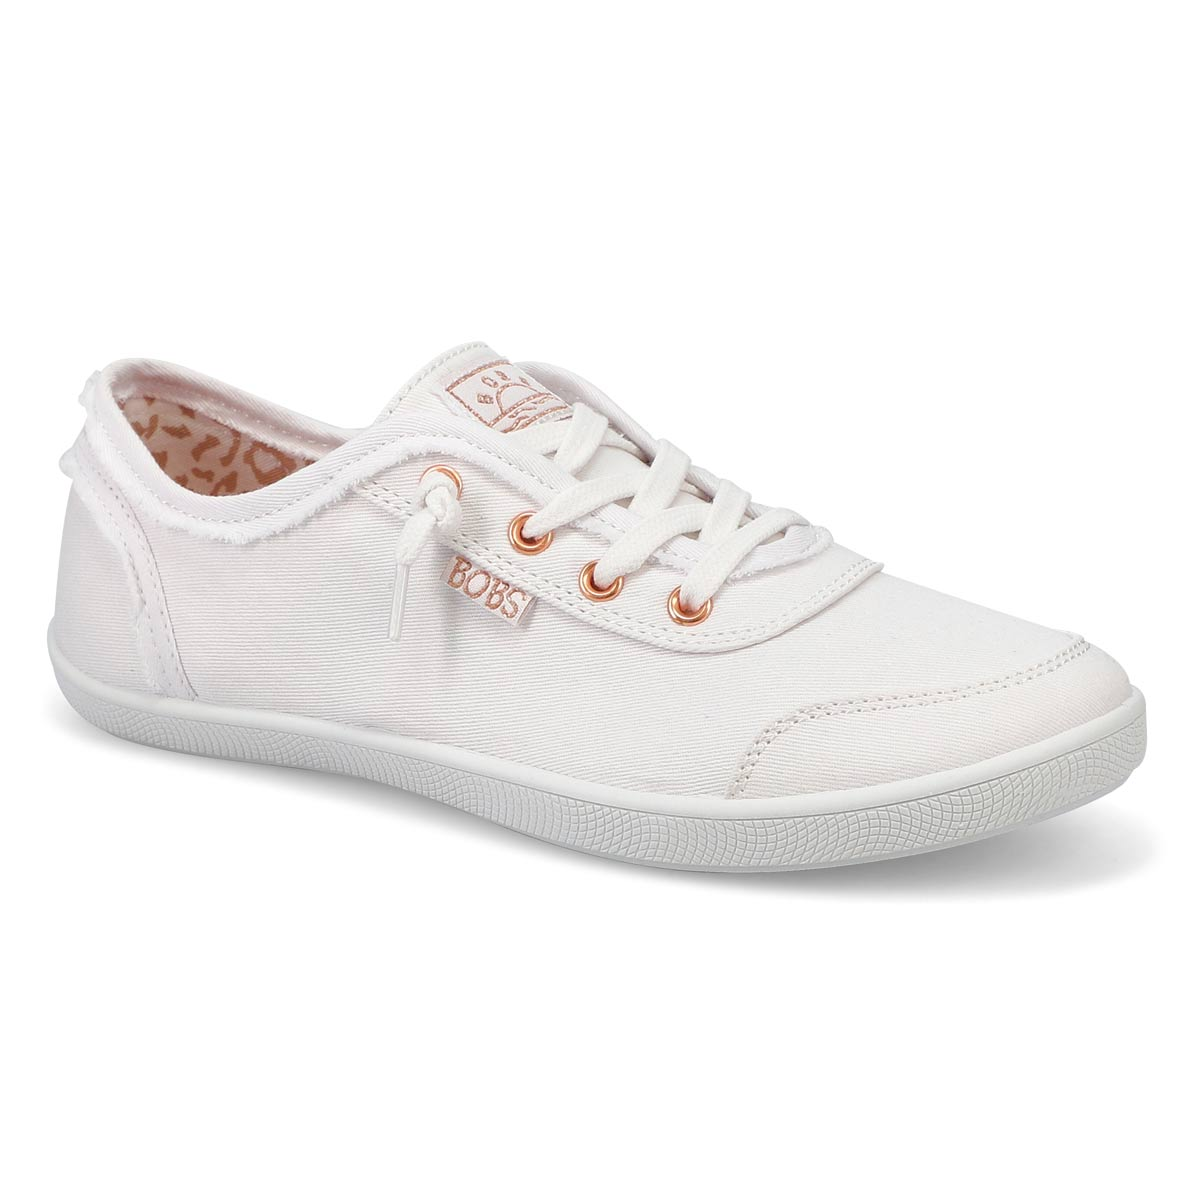 Womens' Bobs B Cute sneakers - white